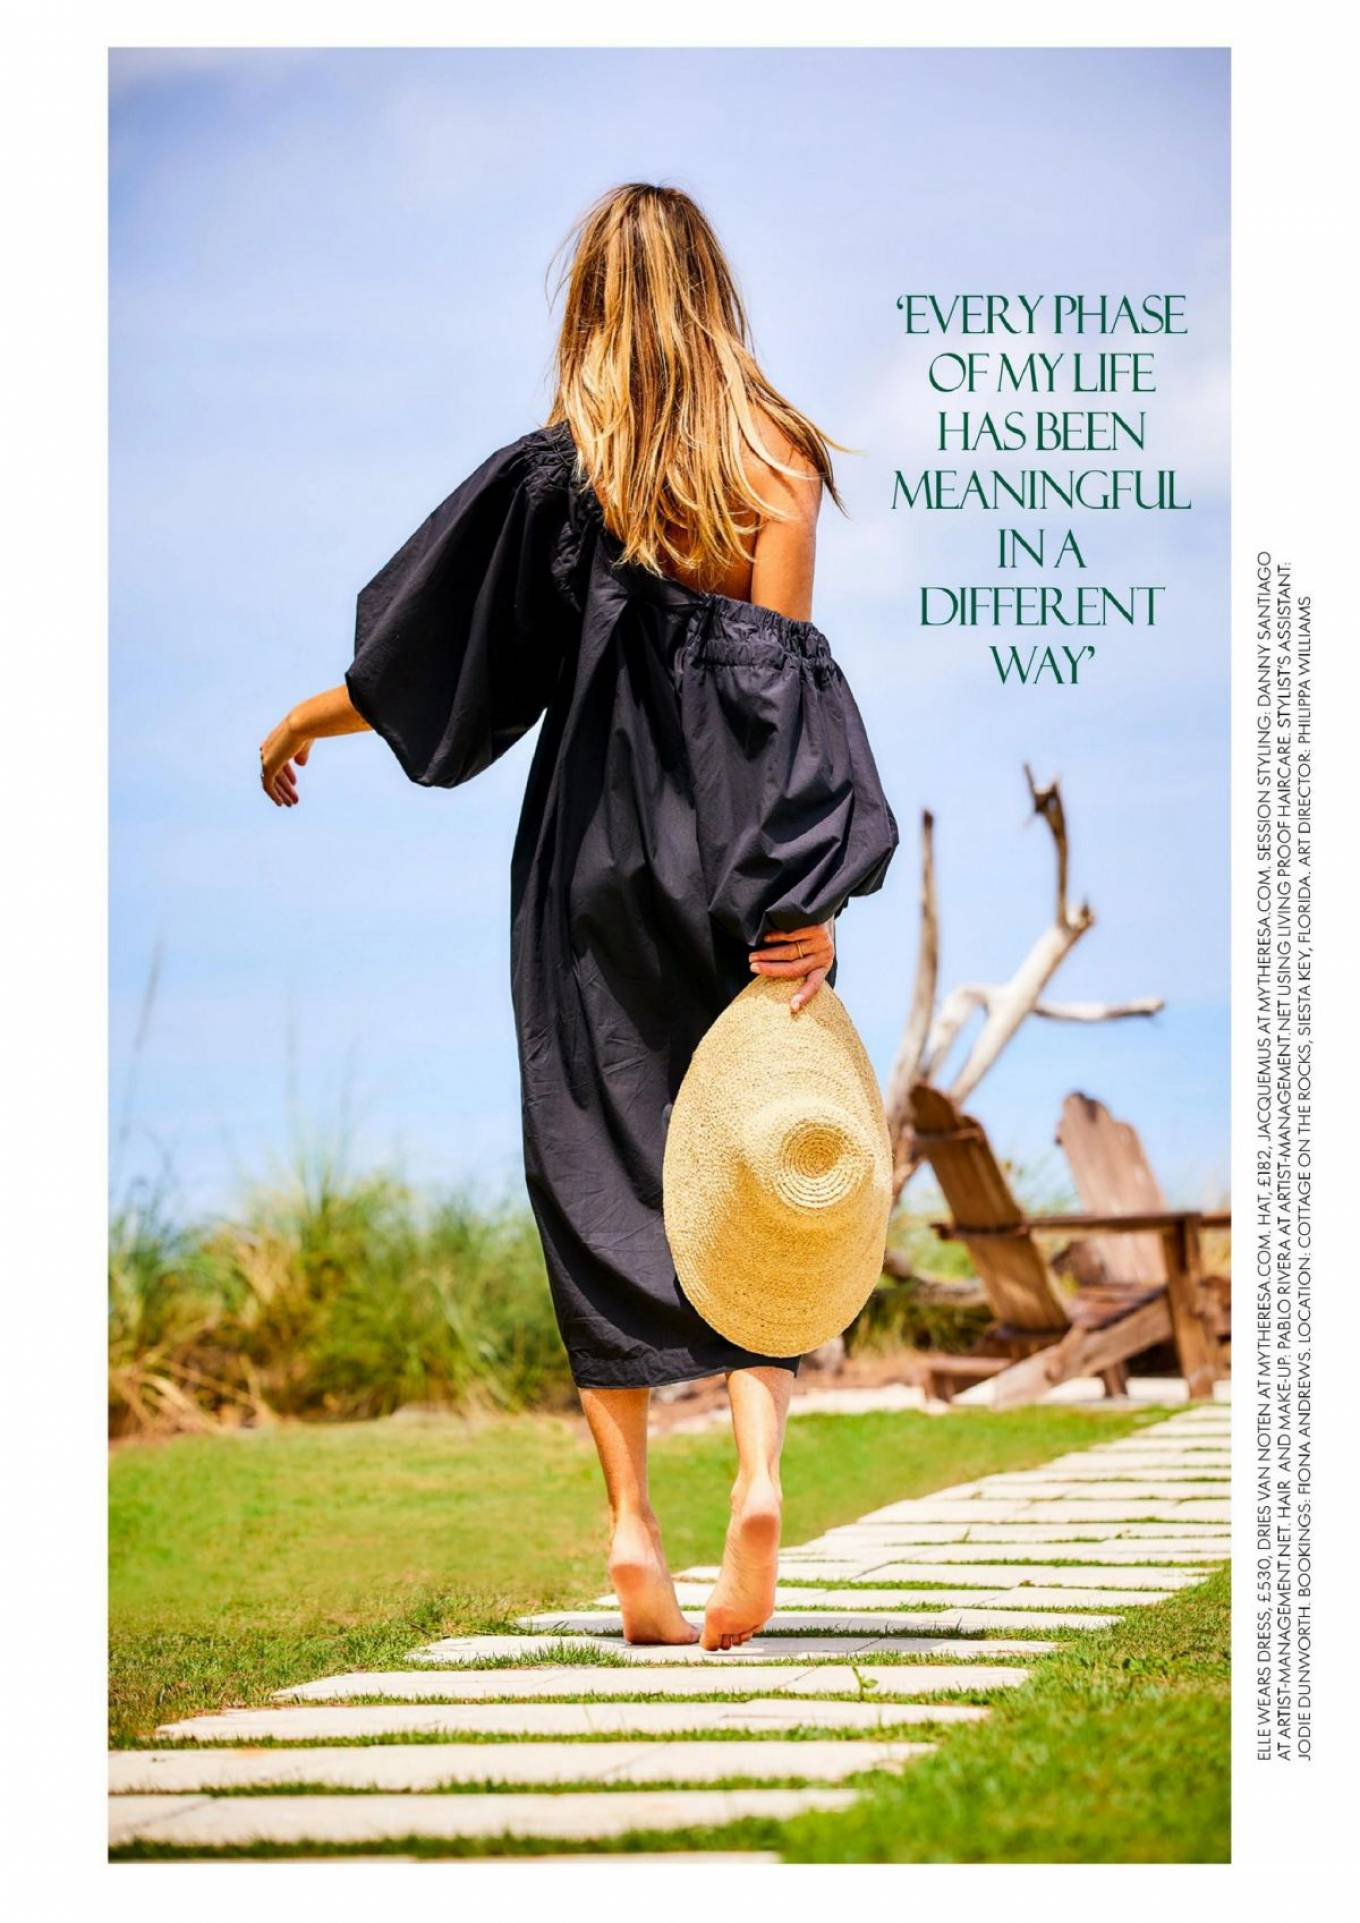 Elle MacPherson 2020 : Elle MacPherson – Red Magazine (UK – August 2020 isseu)-01